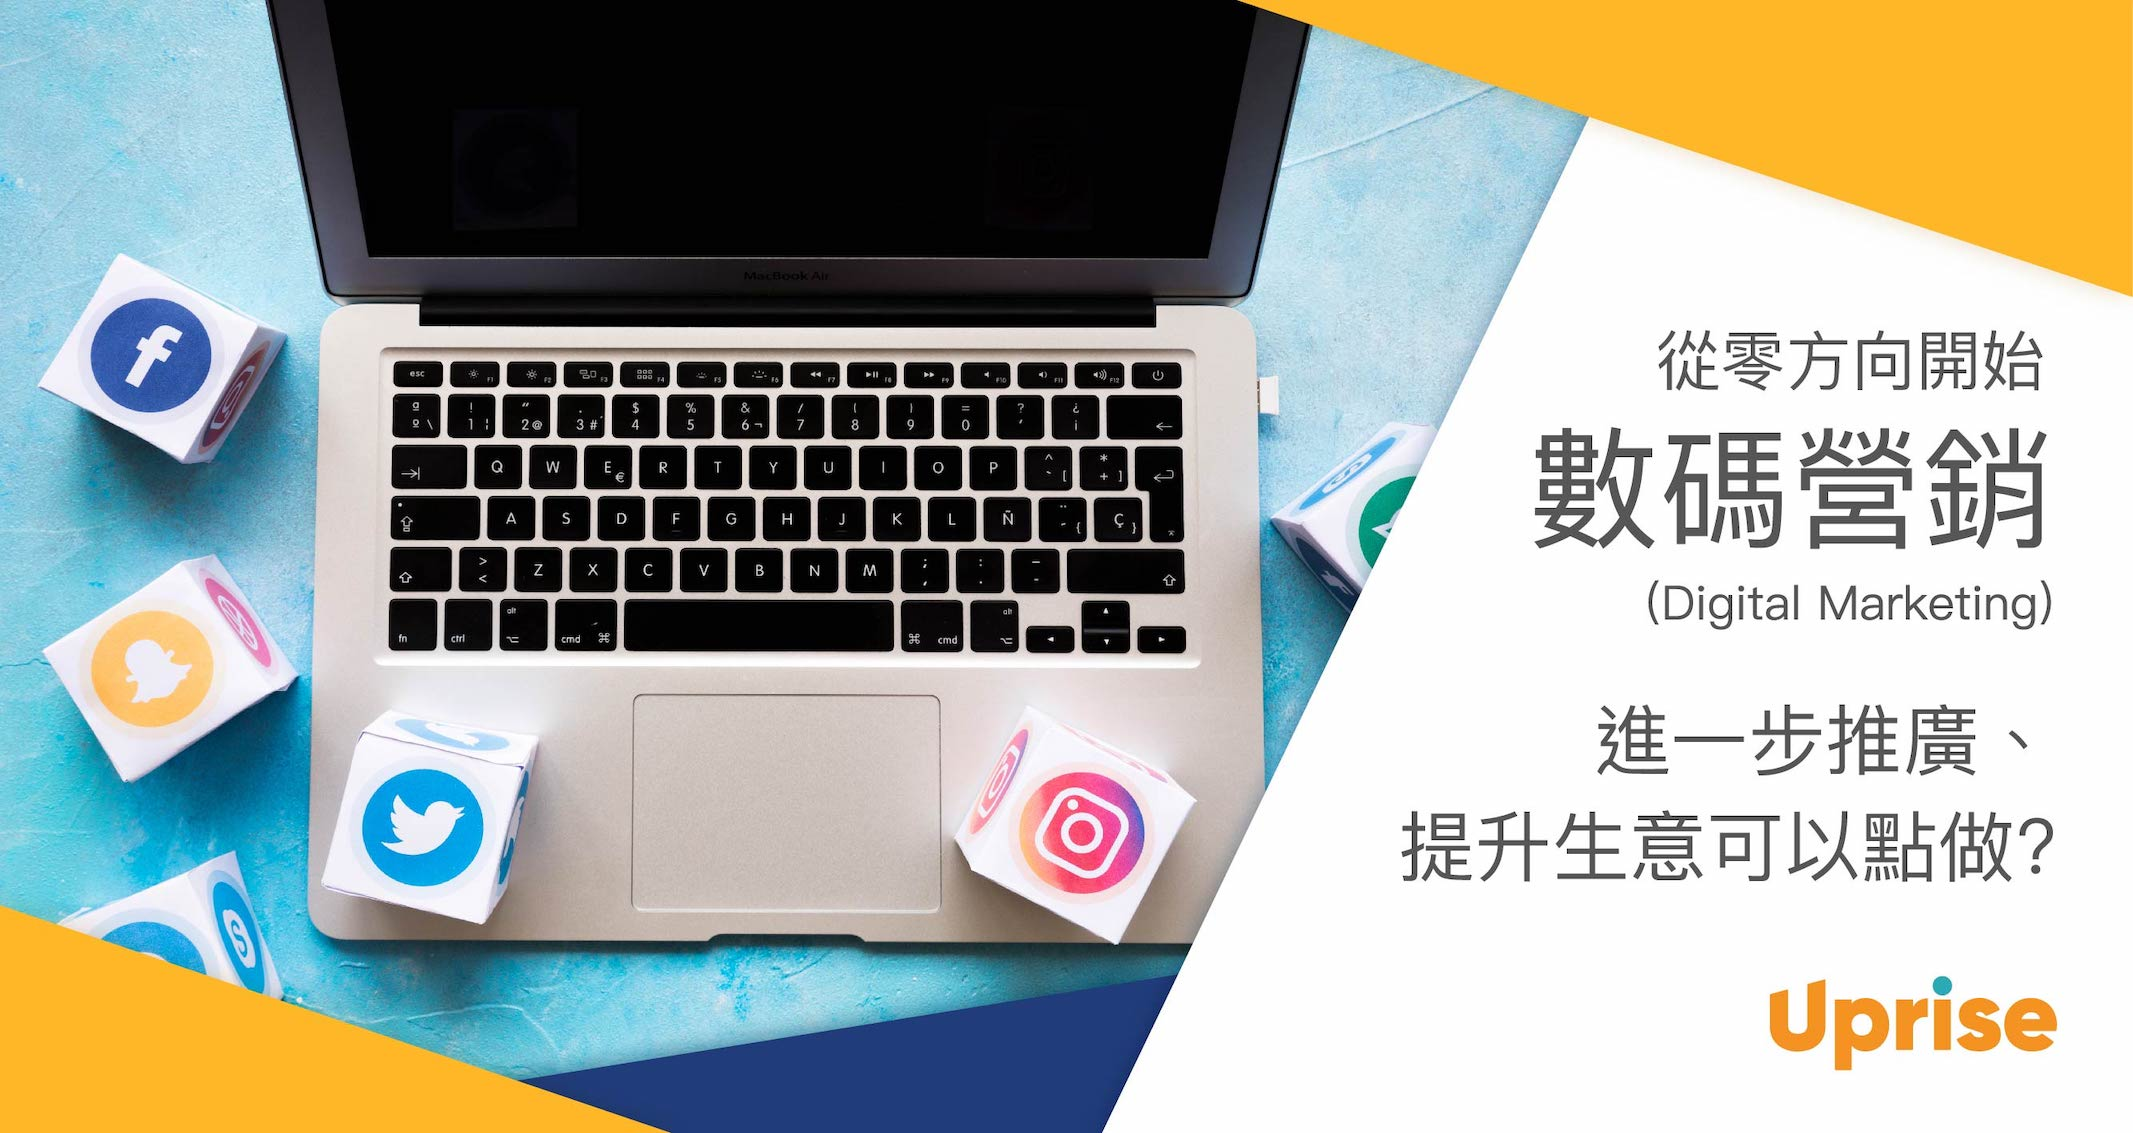 Uprise - Business Insights - 【從零方向開始數碼營銷(Digital Marketing)進一步推廣、提升生意可以點做?】